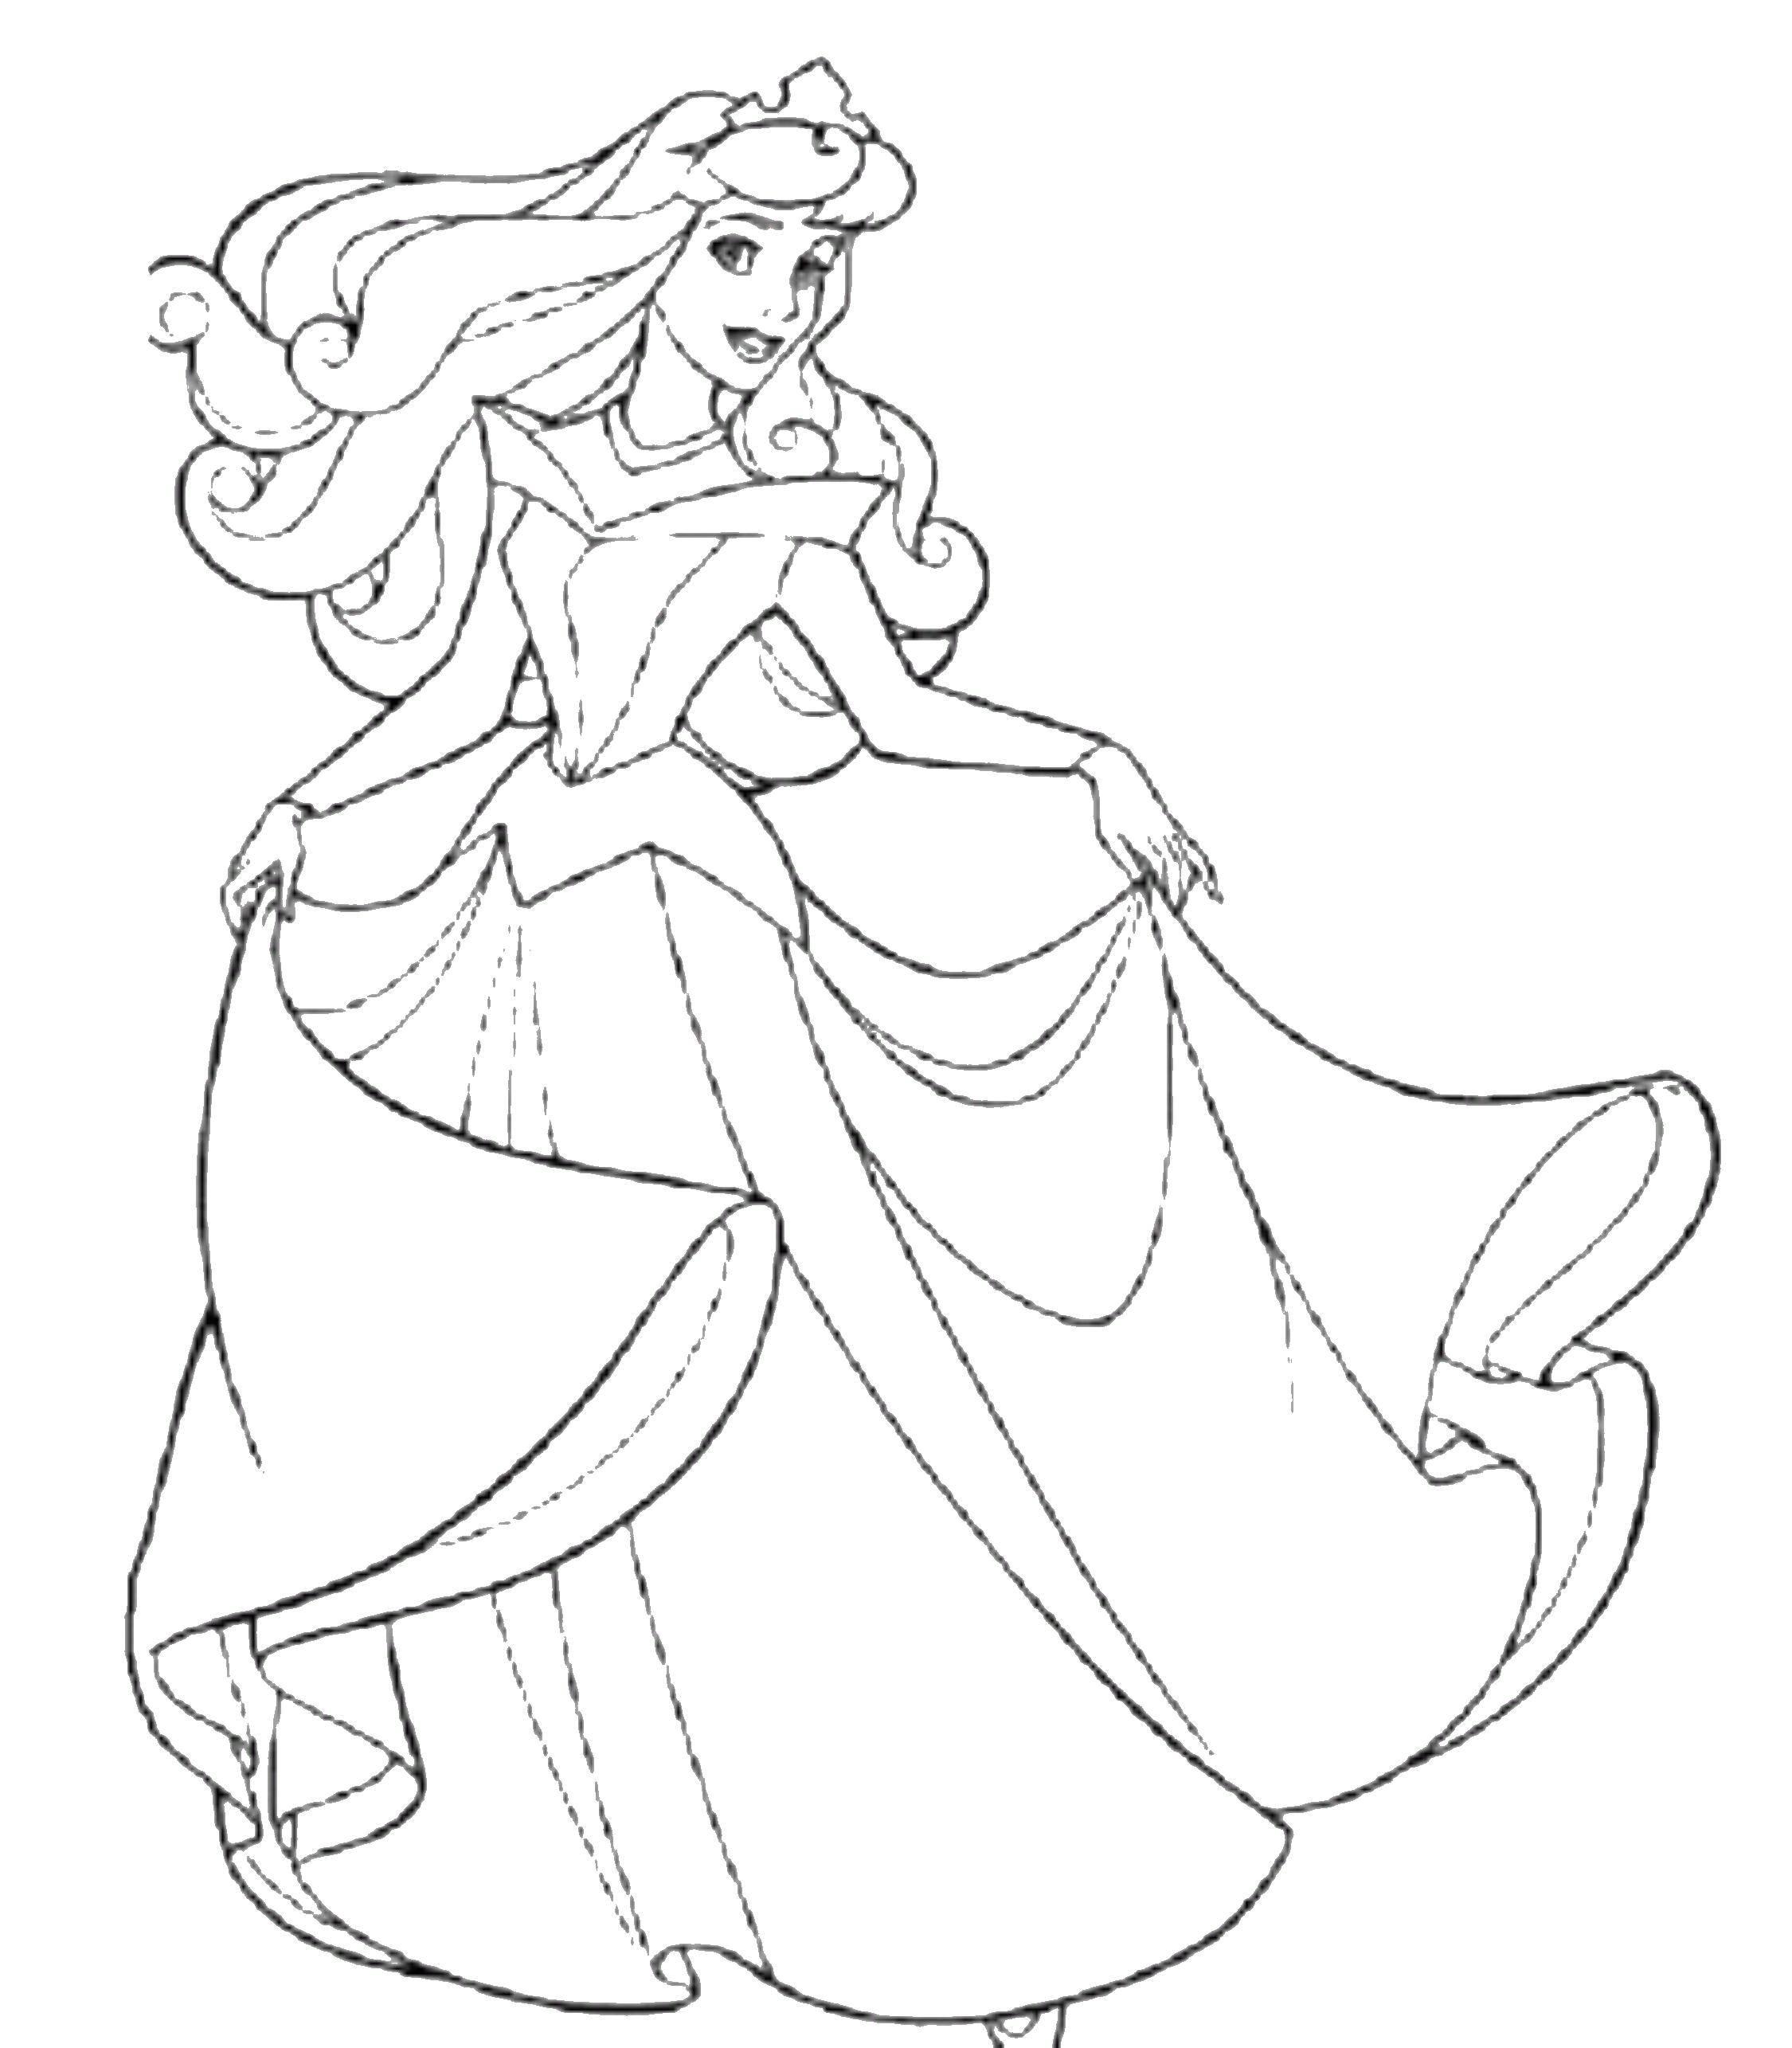 Раскраска Принцесса аврора Скачать принцессы, аврора.  Распечатать ,спящая красавица,